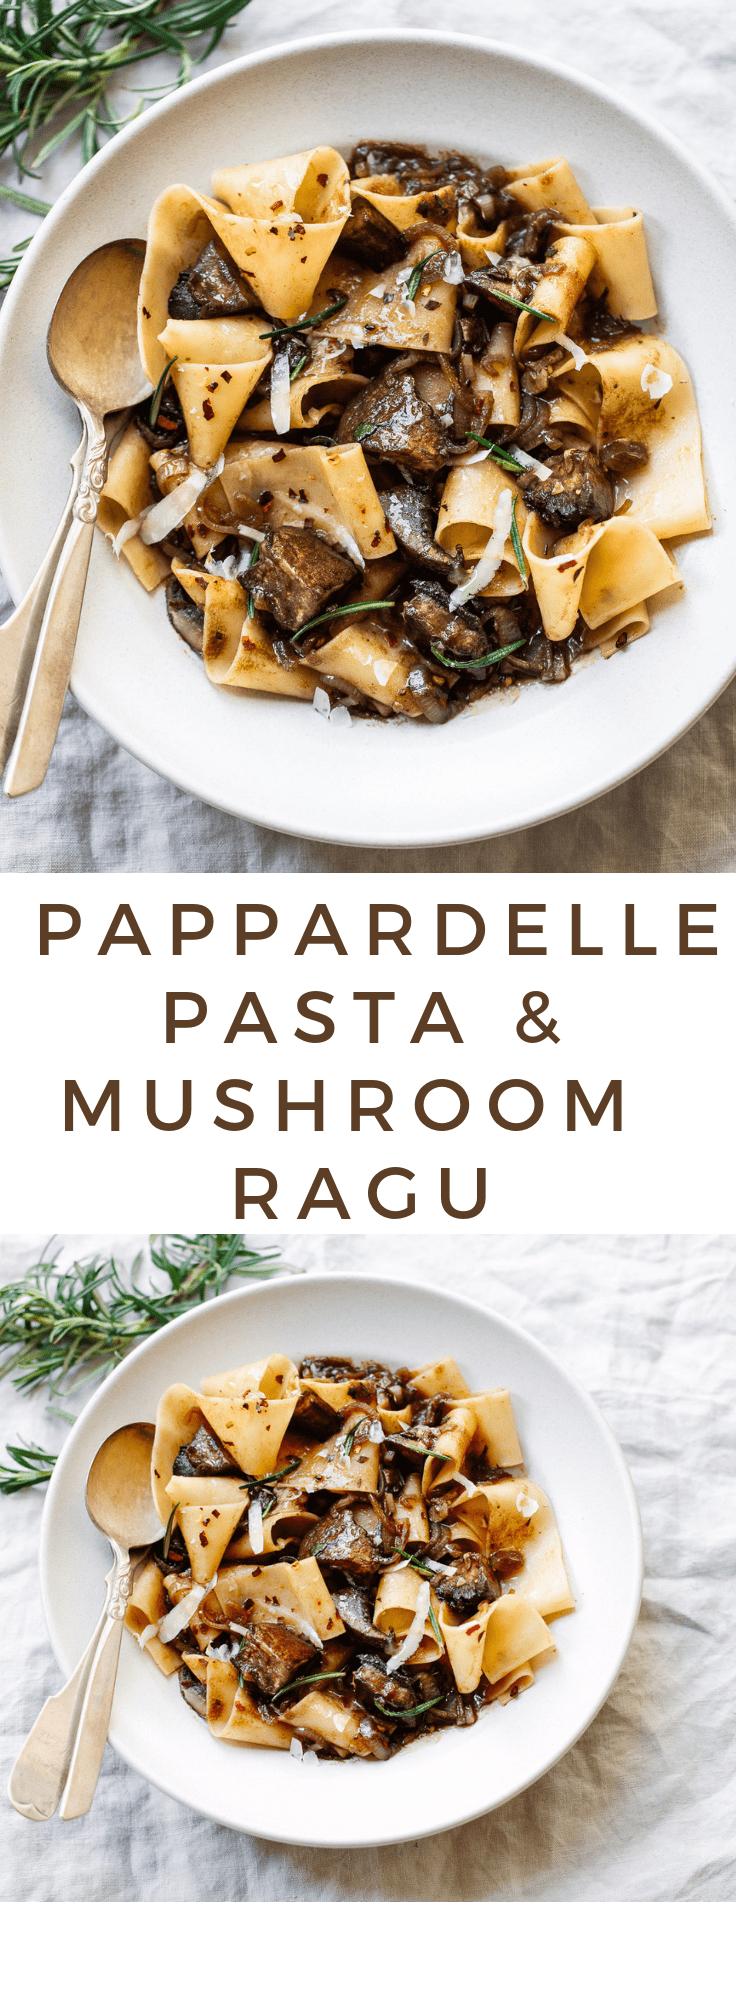 Pasta with Rosemary Portobello Mushroom Sauce Pappardelle Pasta with Wild Mushroom Ragu : onesto makes the ragu with gnocchi instead of noodlesPappardelle Pasta with Wild Mushroom Ragu : onesto makes the ragu with gnocchi instead of noodles